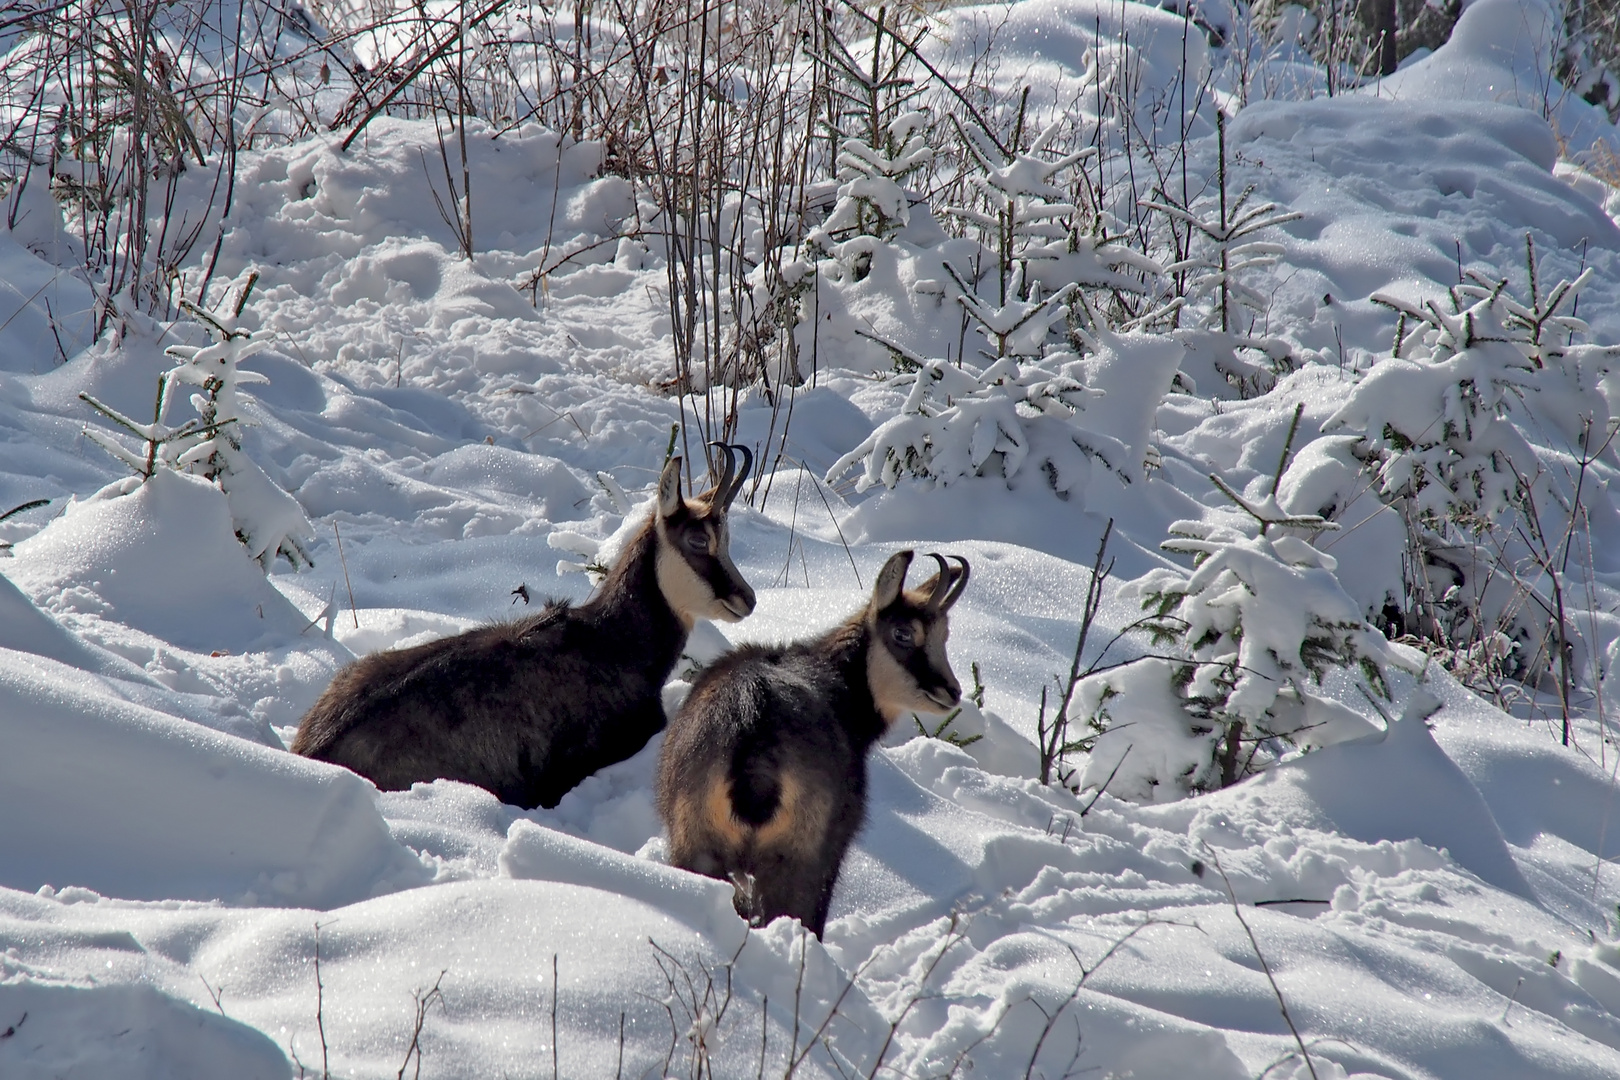 Gämsen (Rupicapra rupicapra) im tiefen Schnee.  -  Deux chamois dans la neige profonde.